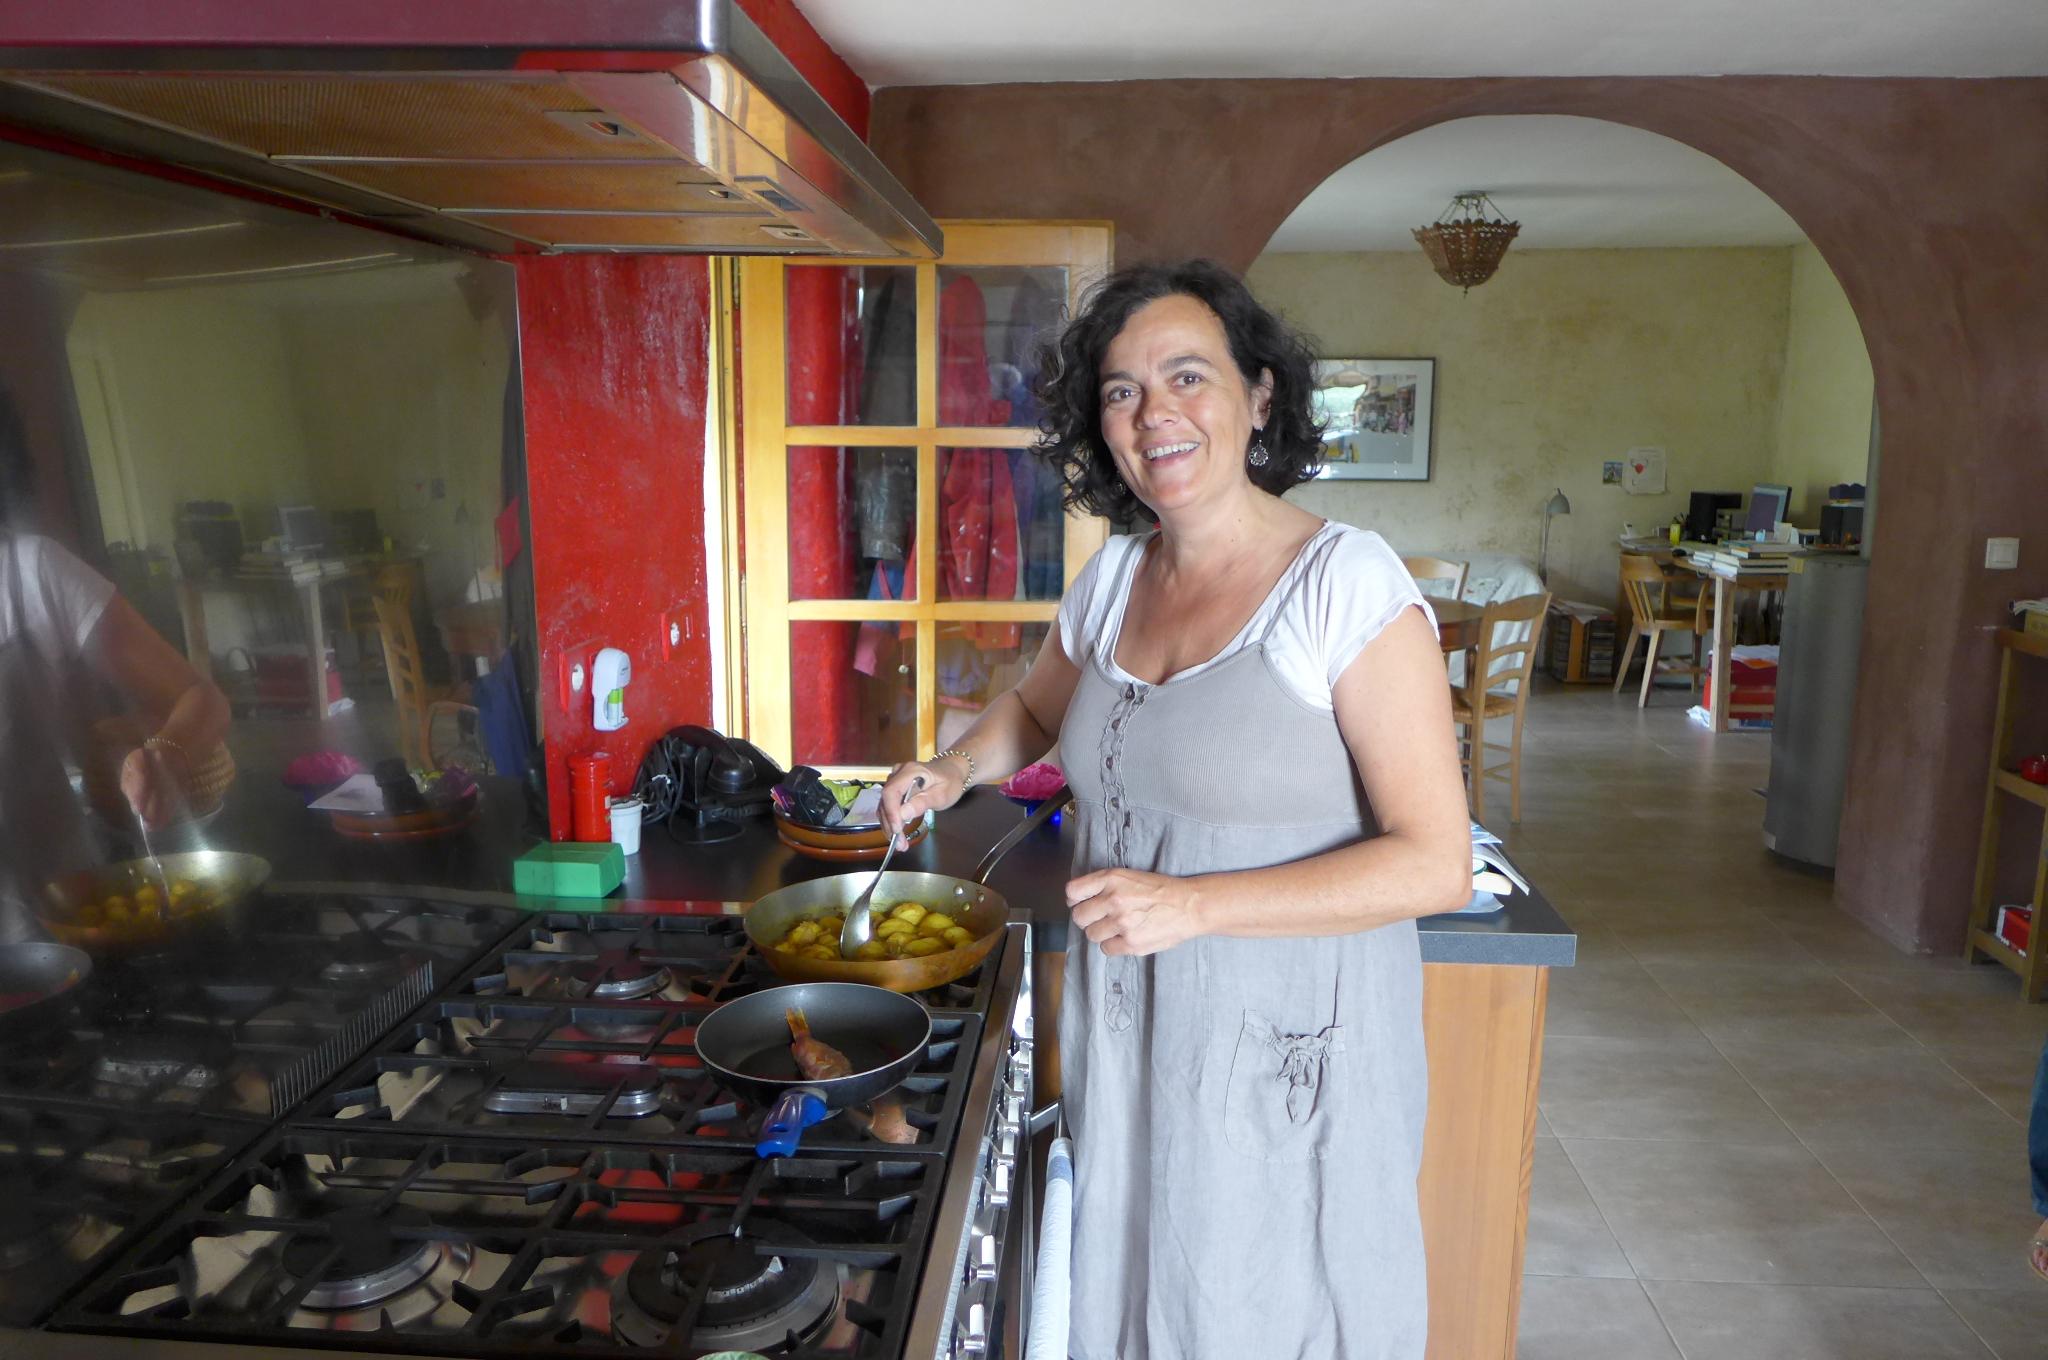 la cuisine d edith cours de cuisine saint andr de cruzi res restaurant edith et sa cuisine. Black Bedroom Furniture Sets. Home Design Ideas